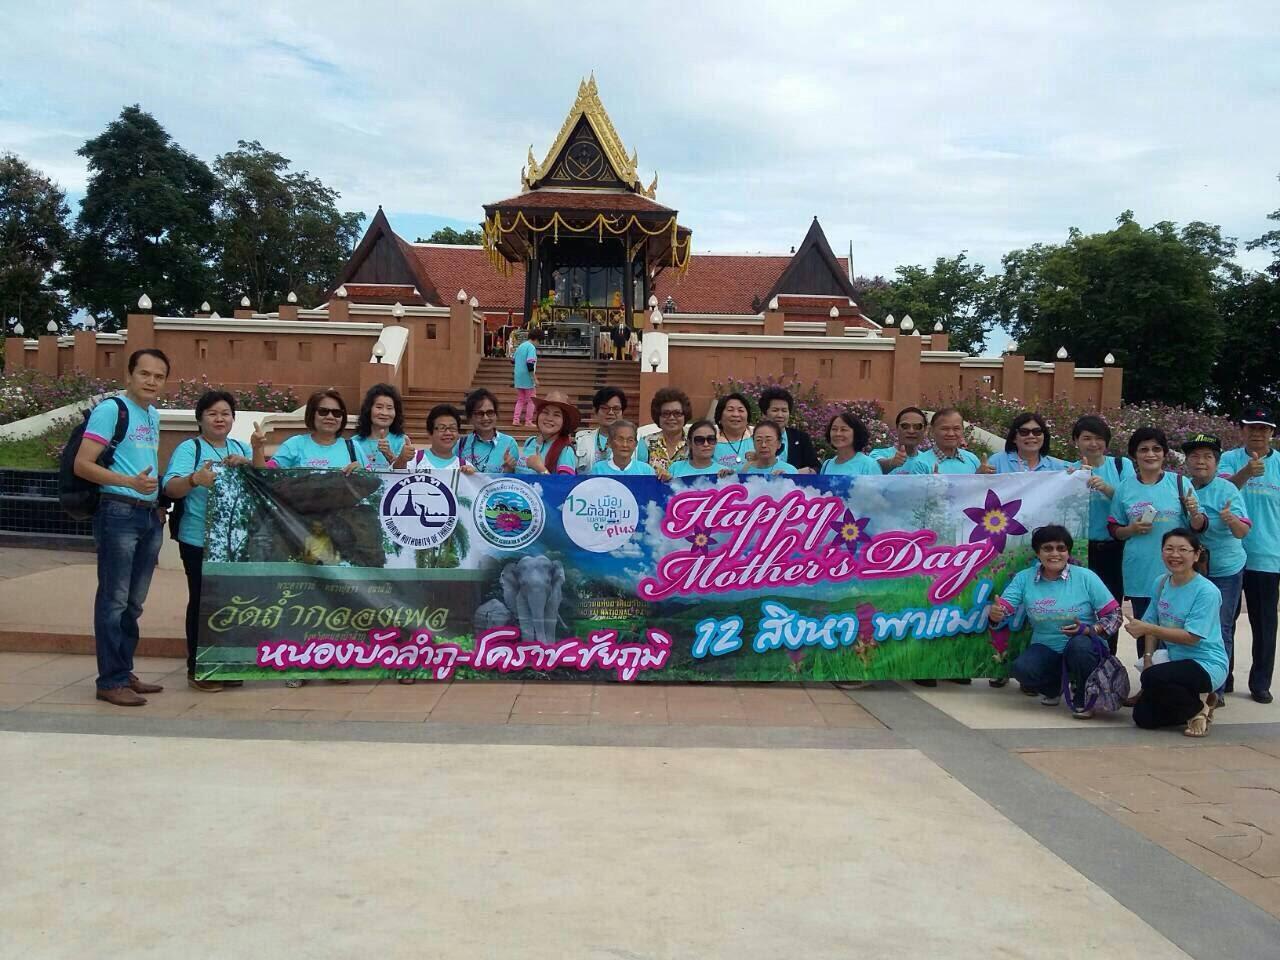 His majesty King Naresuan the Great Shrine